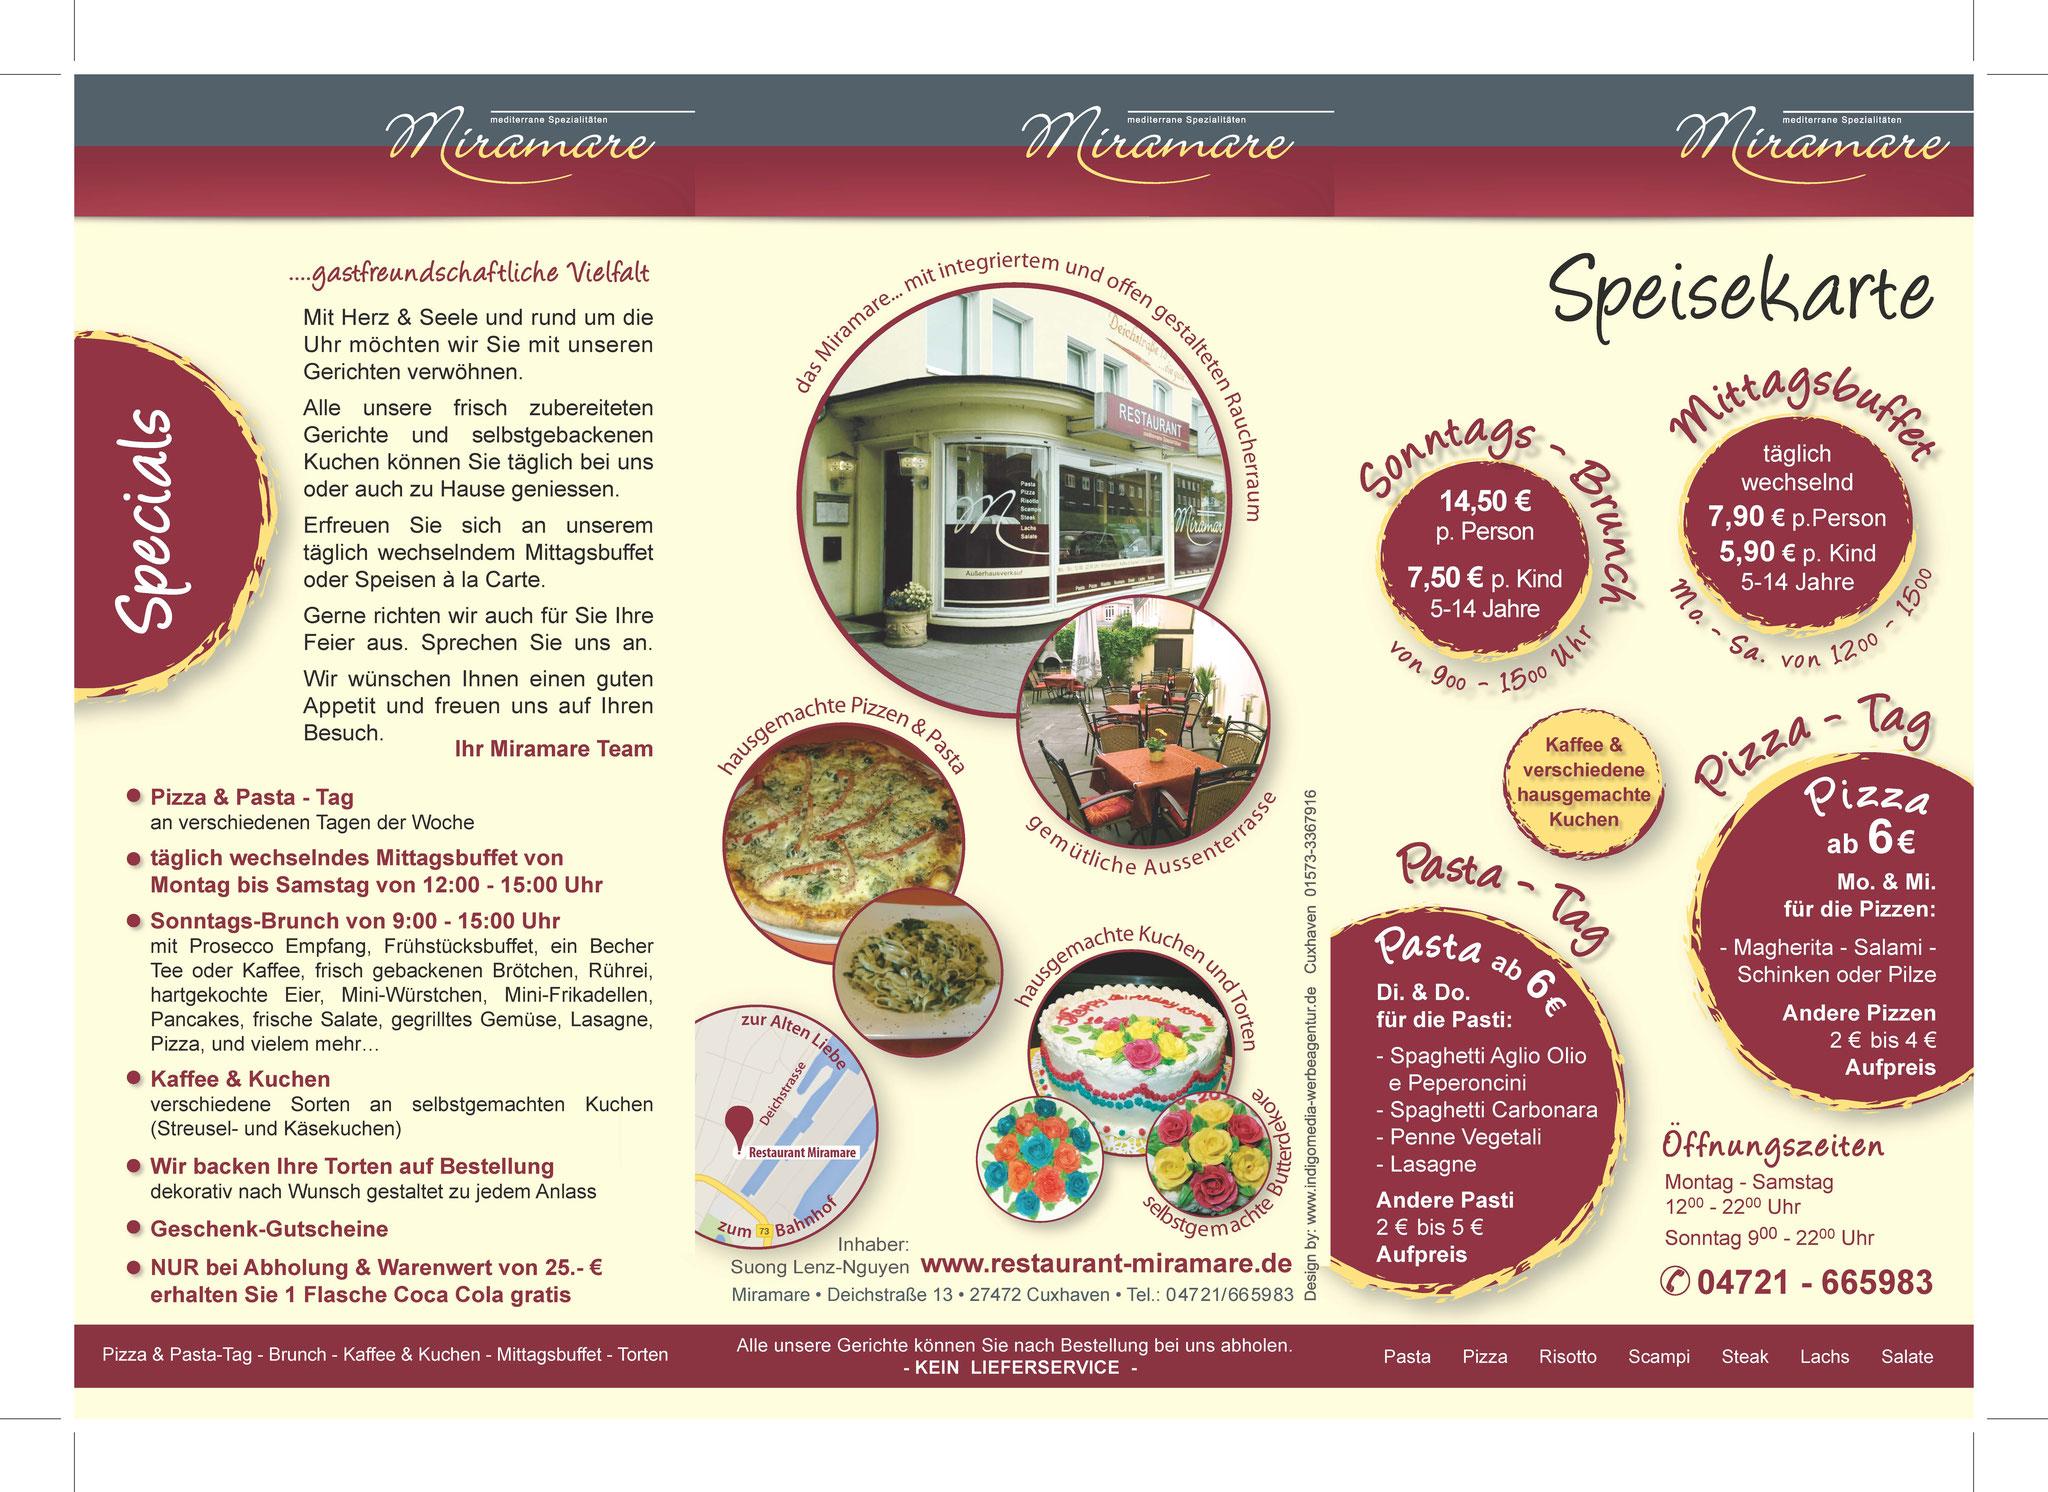 Speisekarte Pizzeria Miramare, Cuxhaven Germany